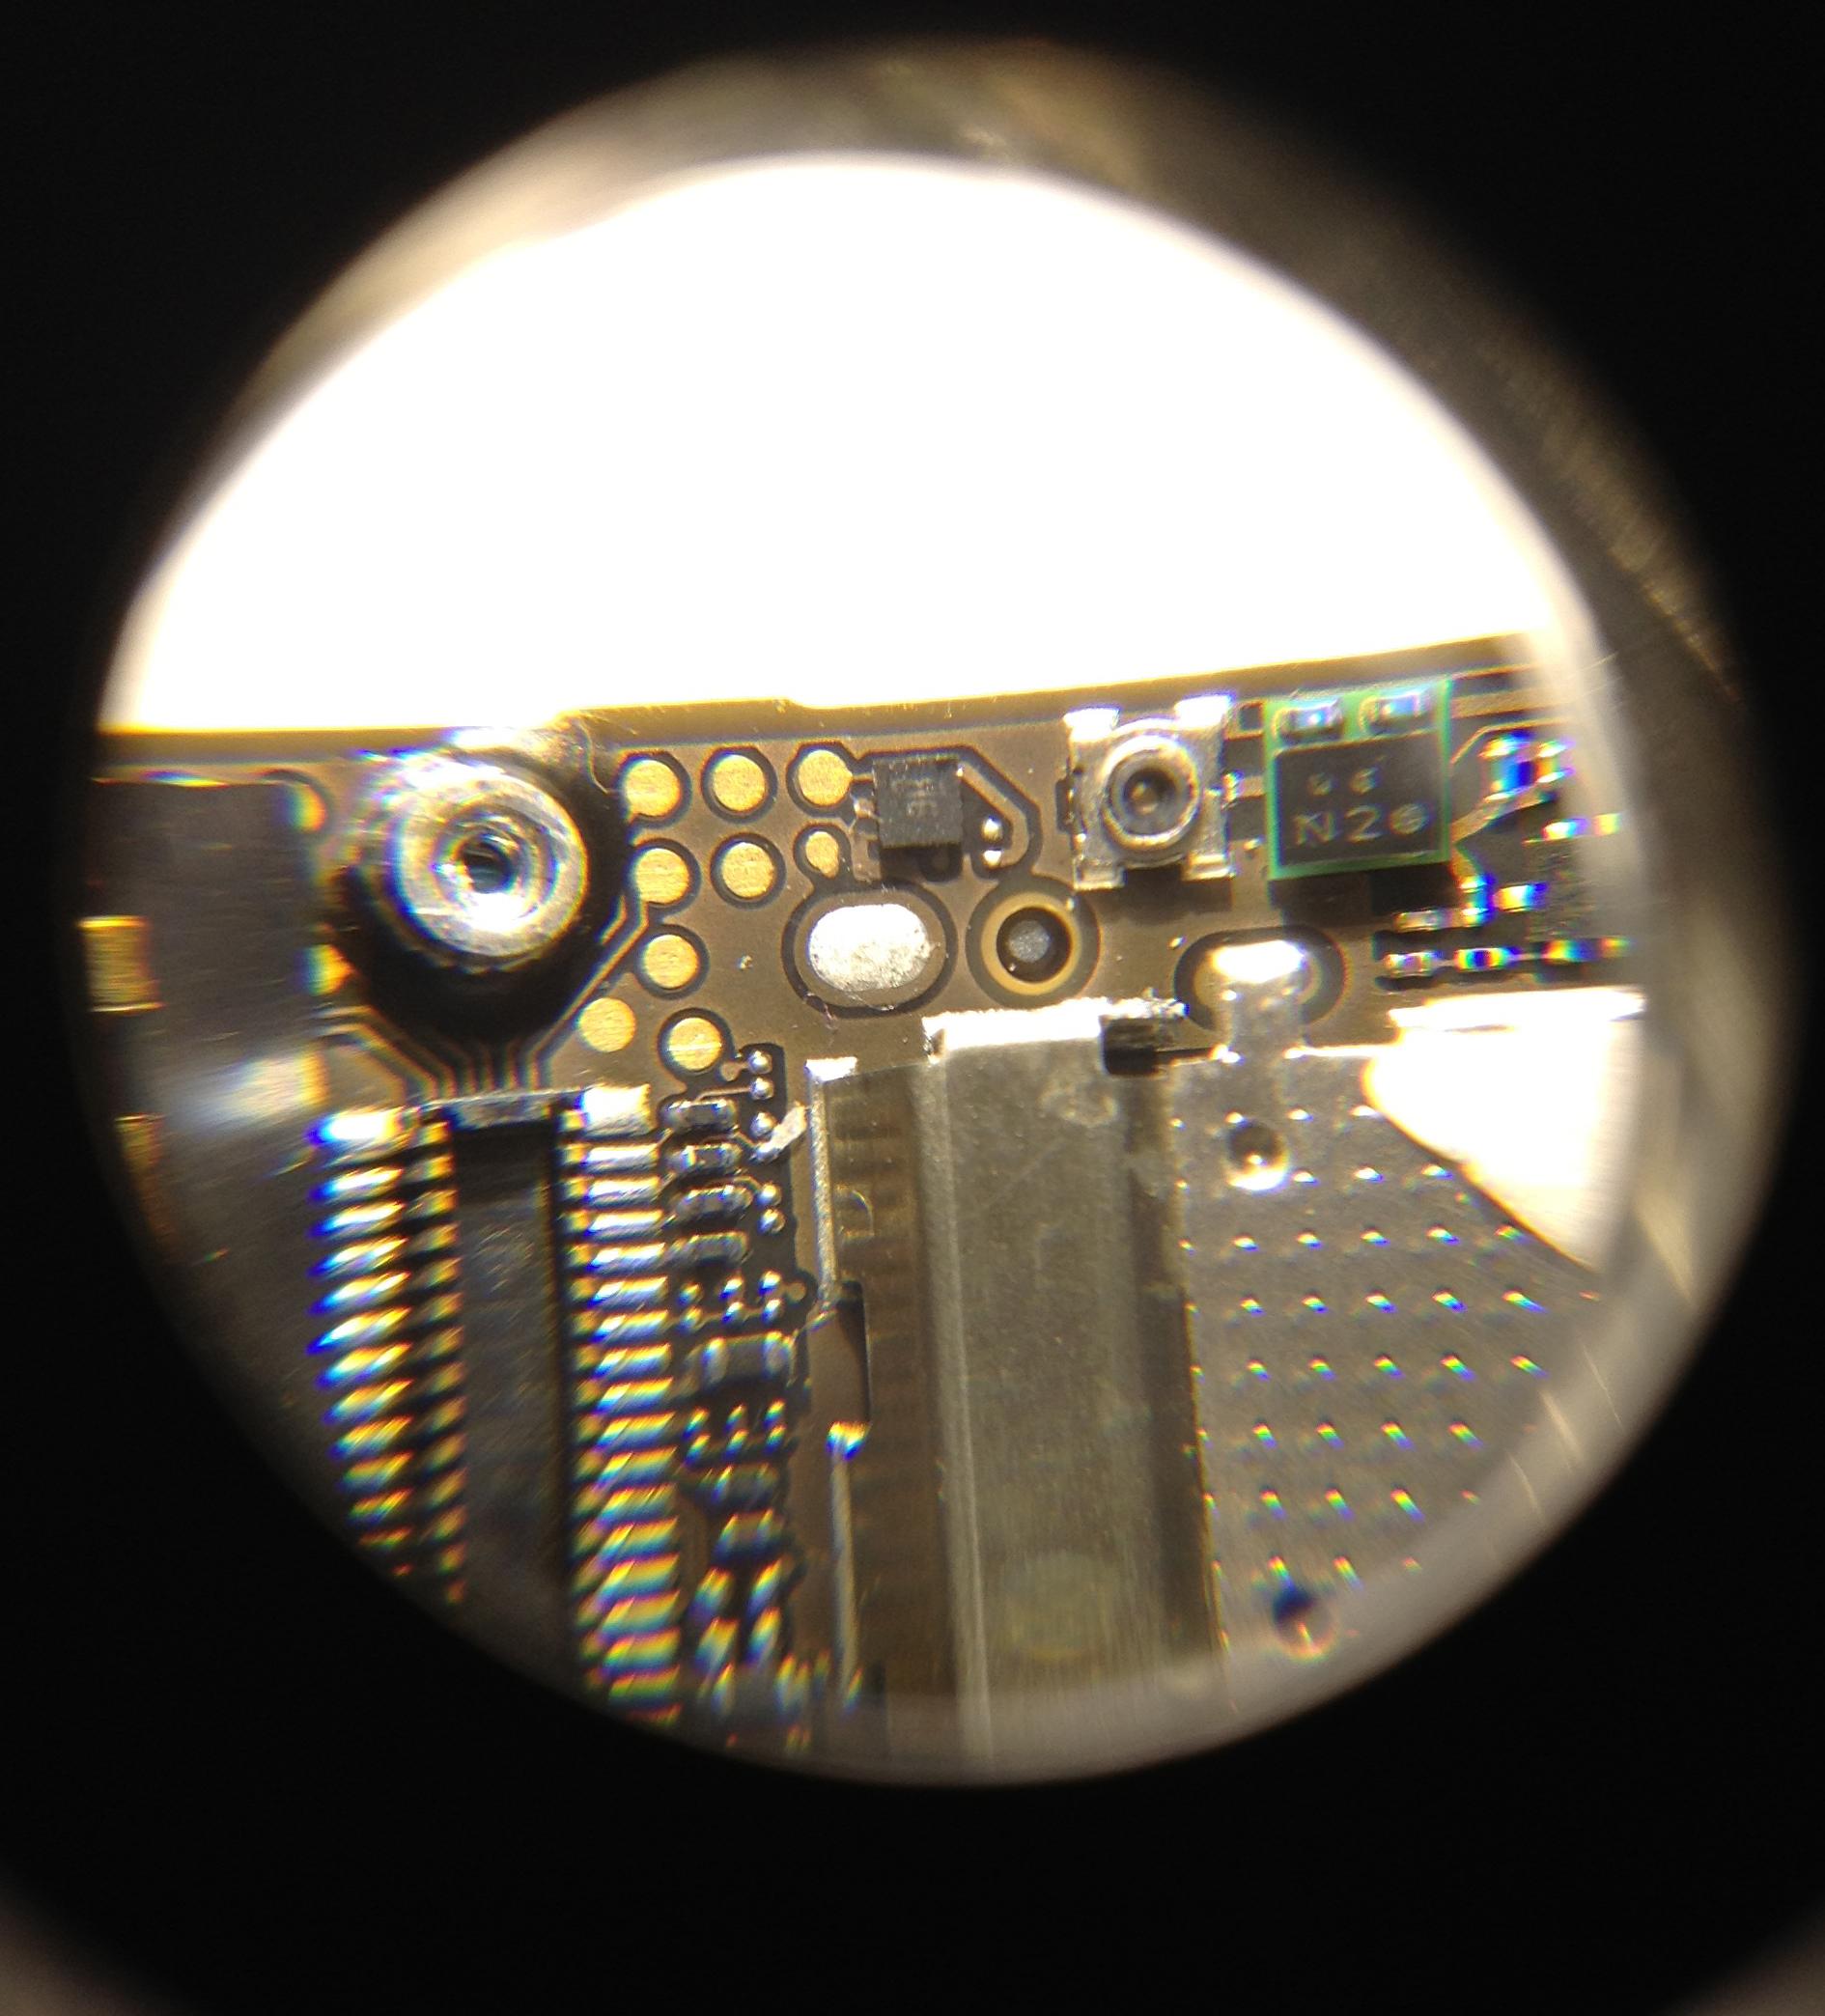 Iphone 4s - u�amany mikroskopijny uk�ad spos�b monta�u